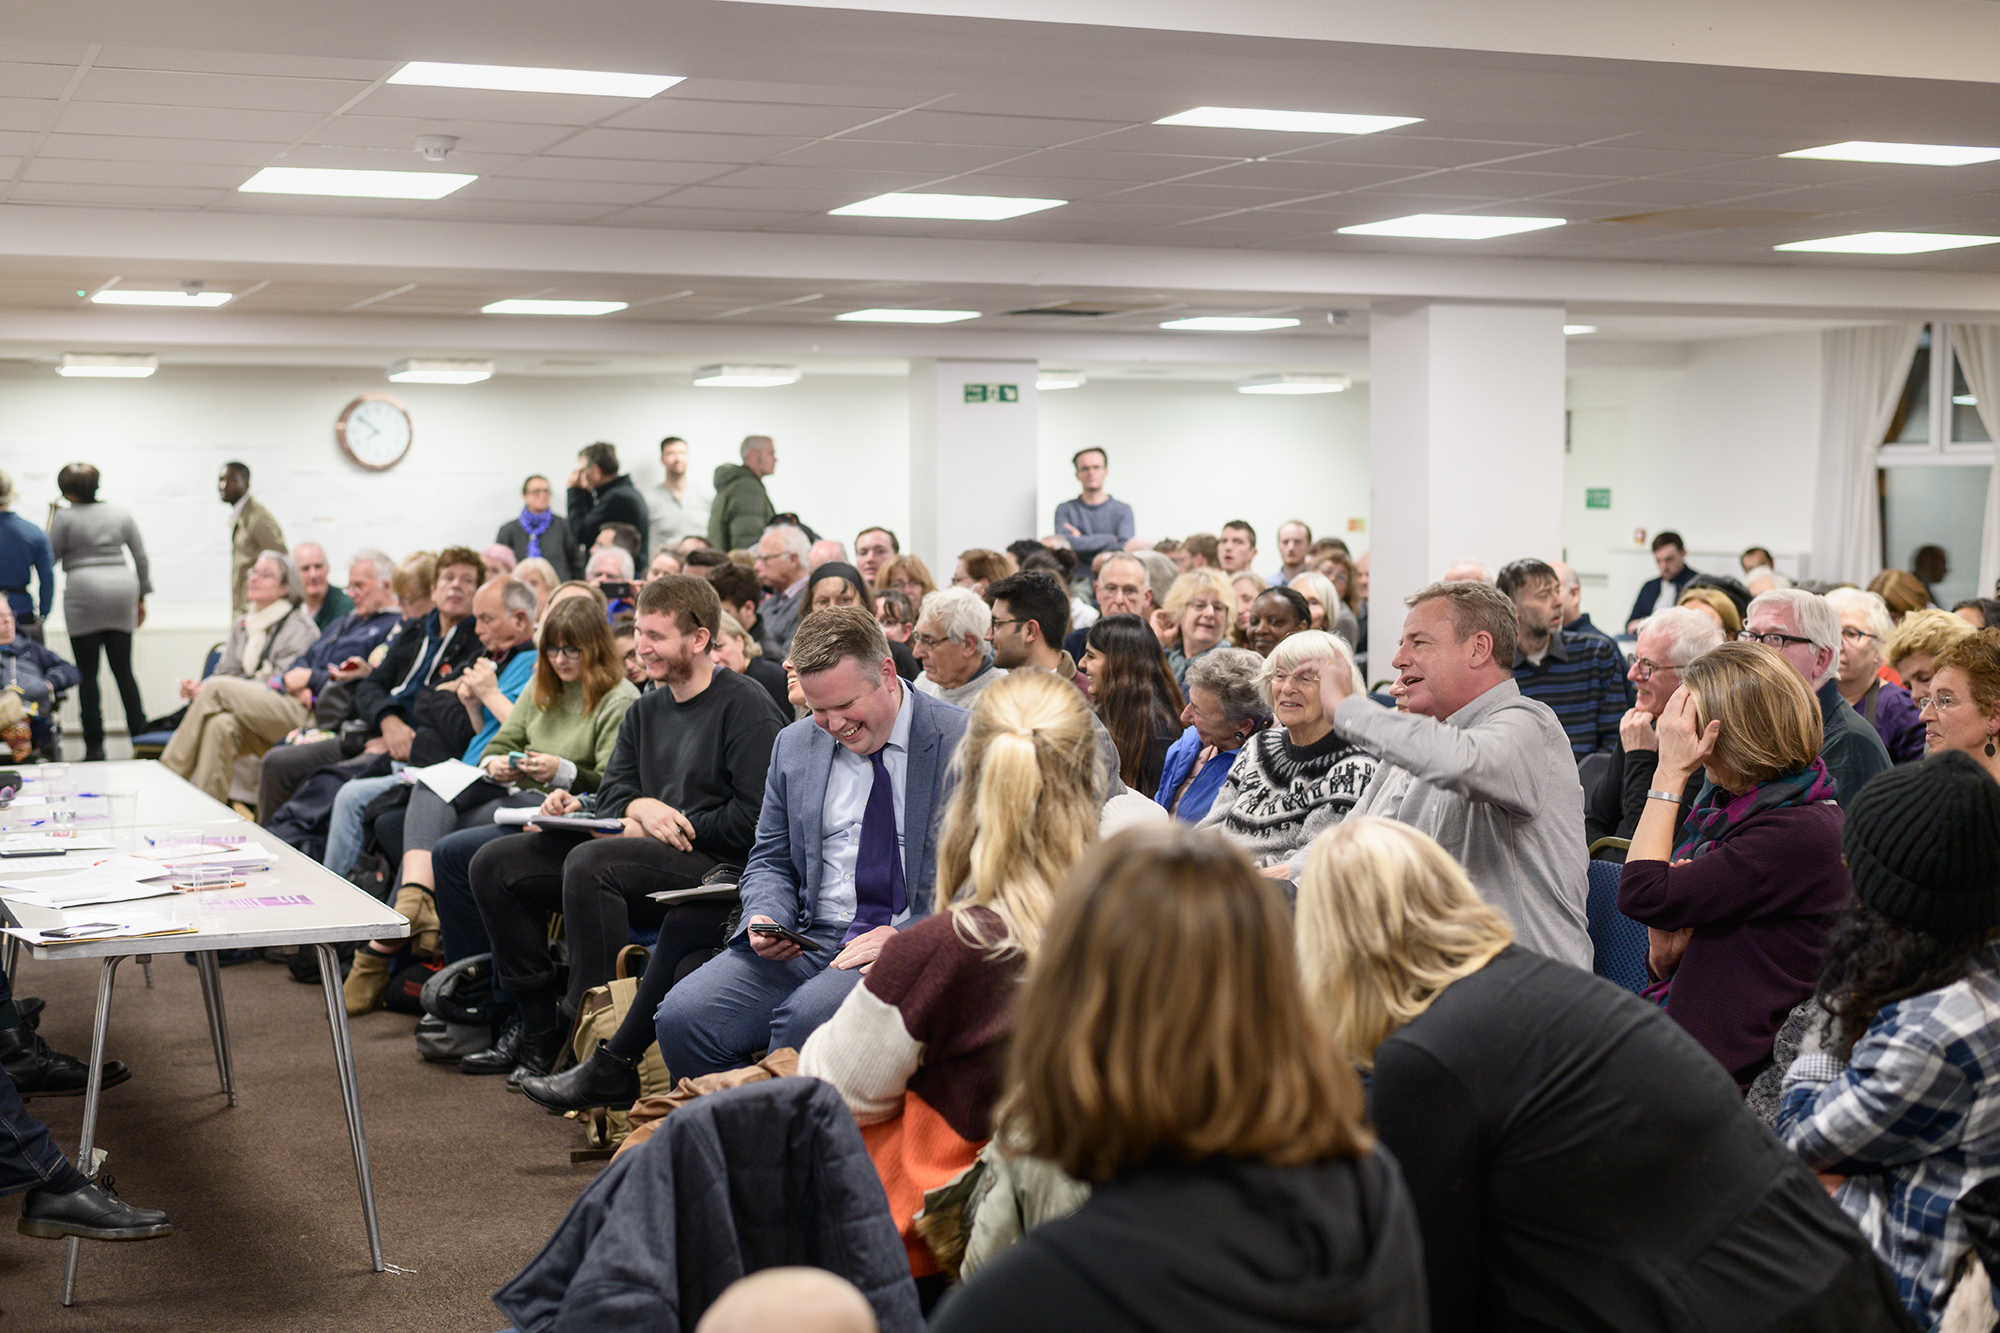 Community Plan for Holloway Meeting. 20th Nov 2018